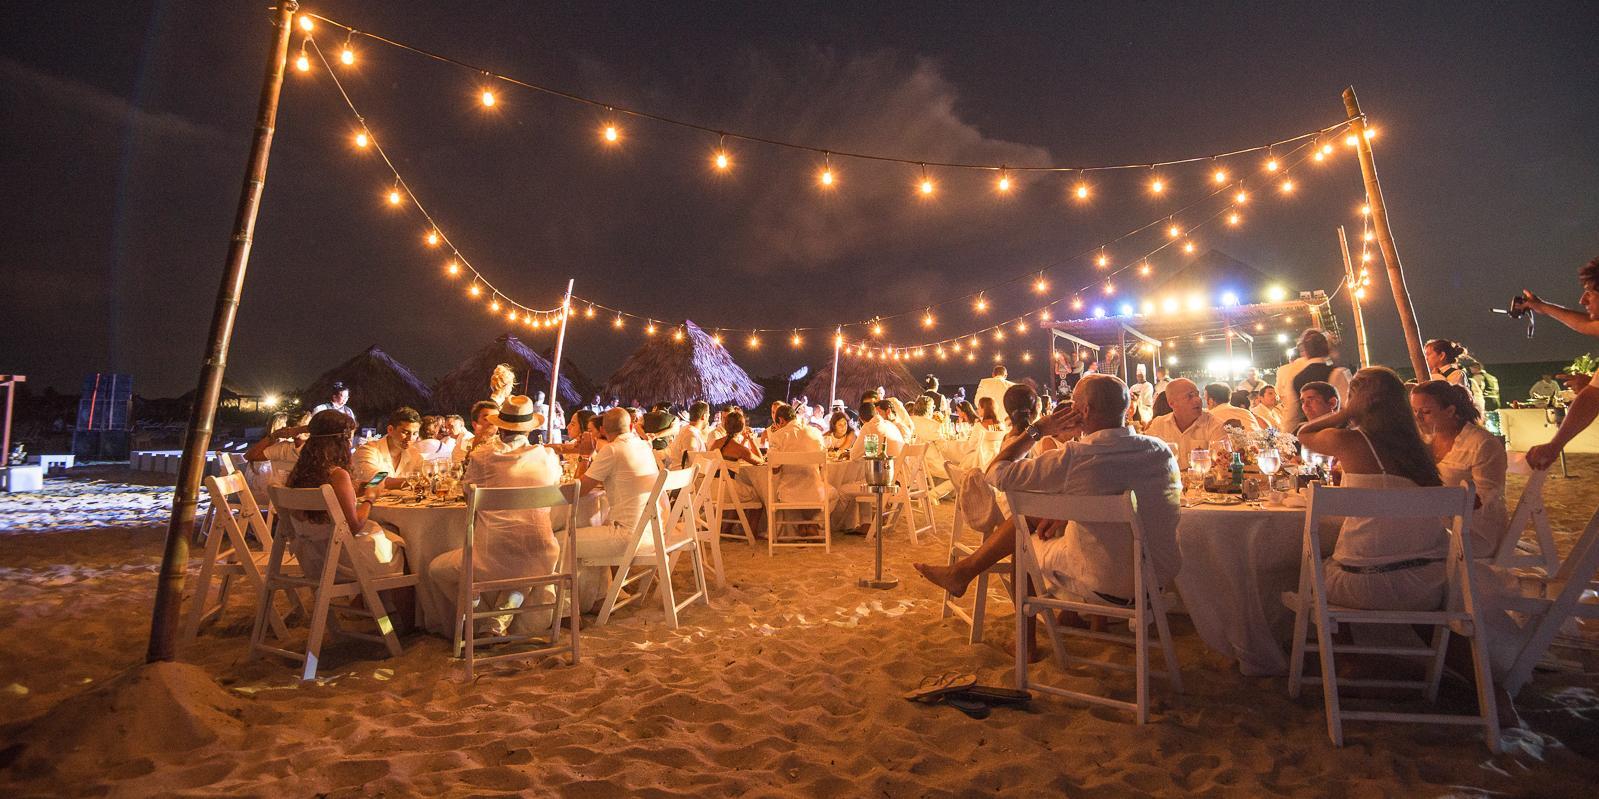 bodas-rustico-playa-cuba-6801.jpg